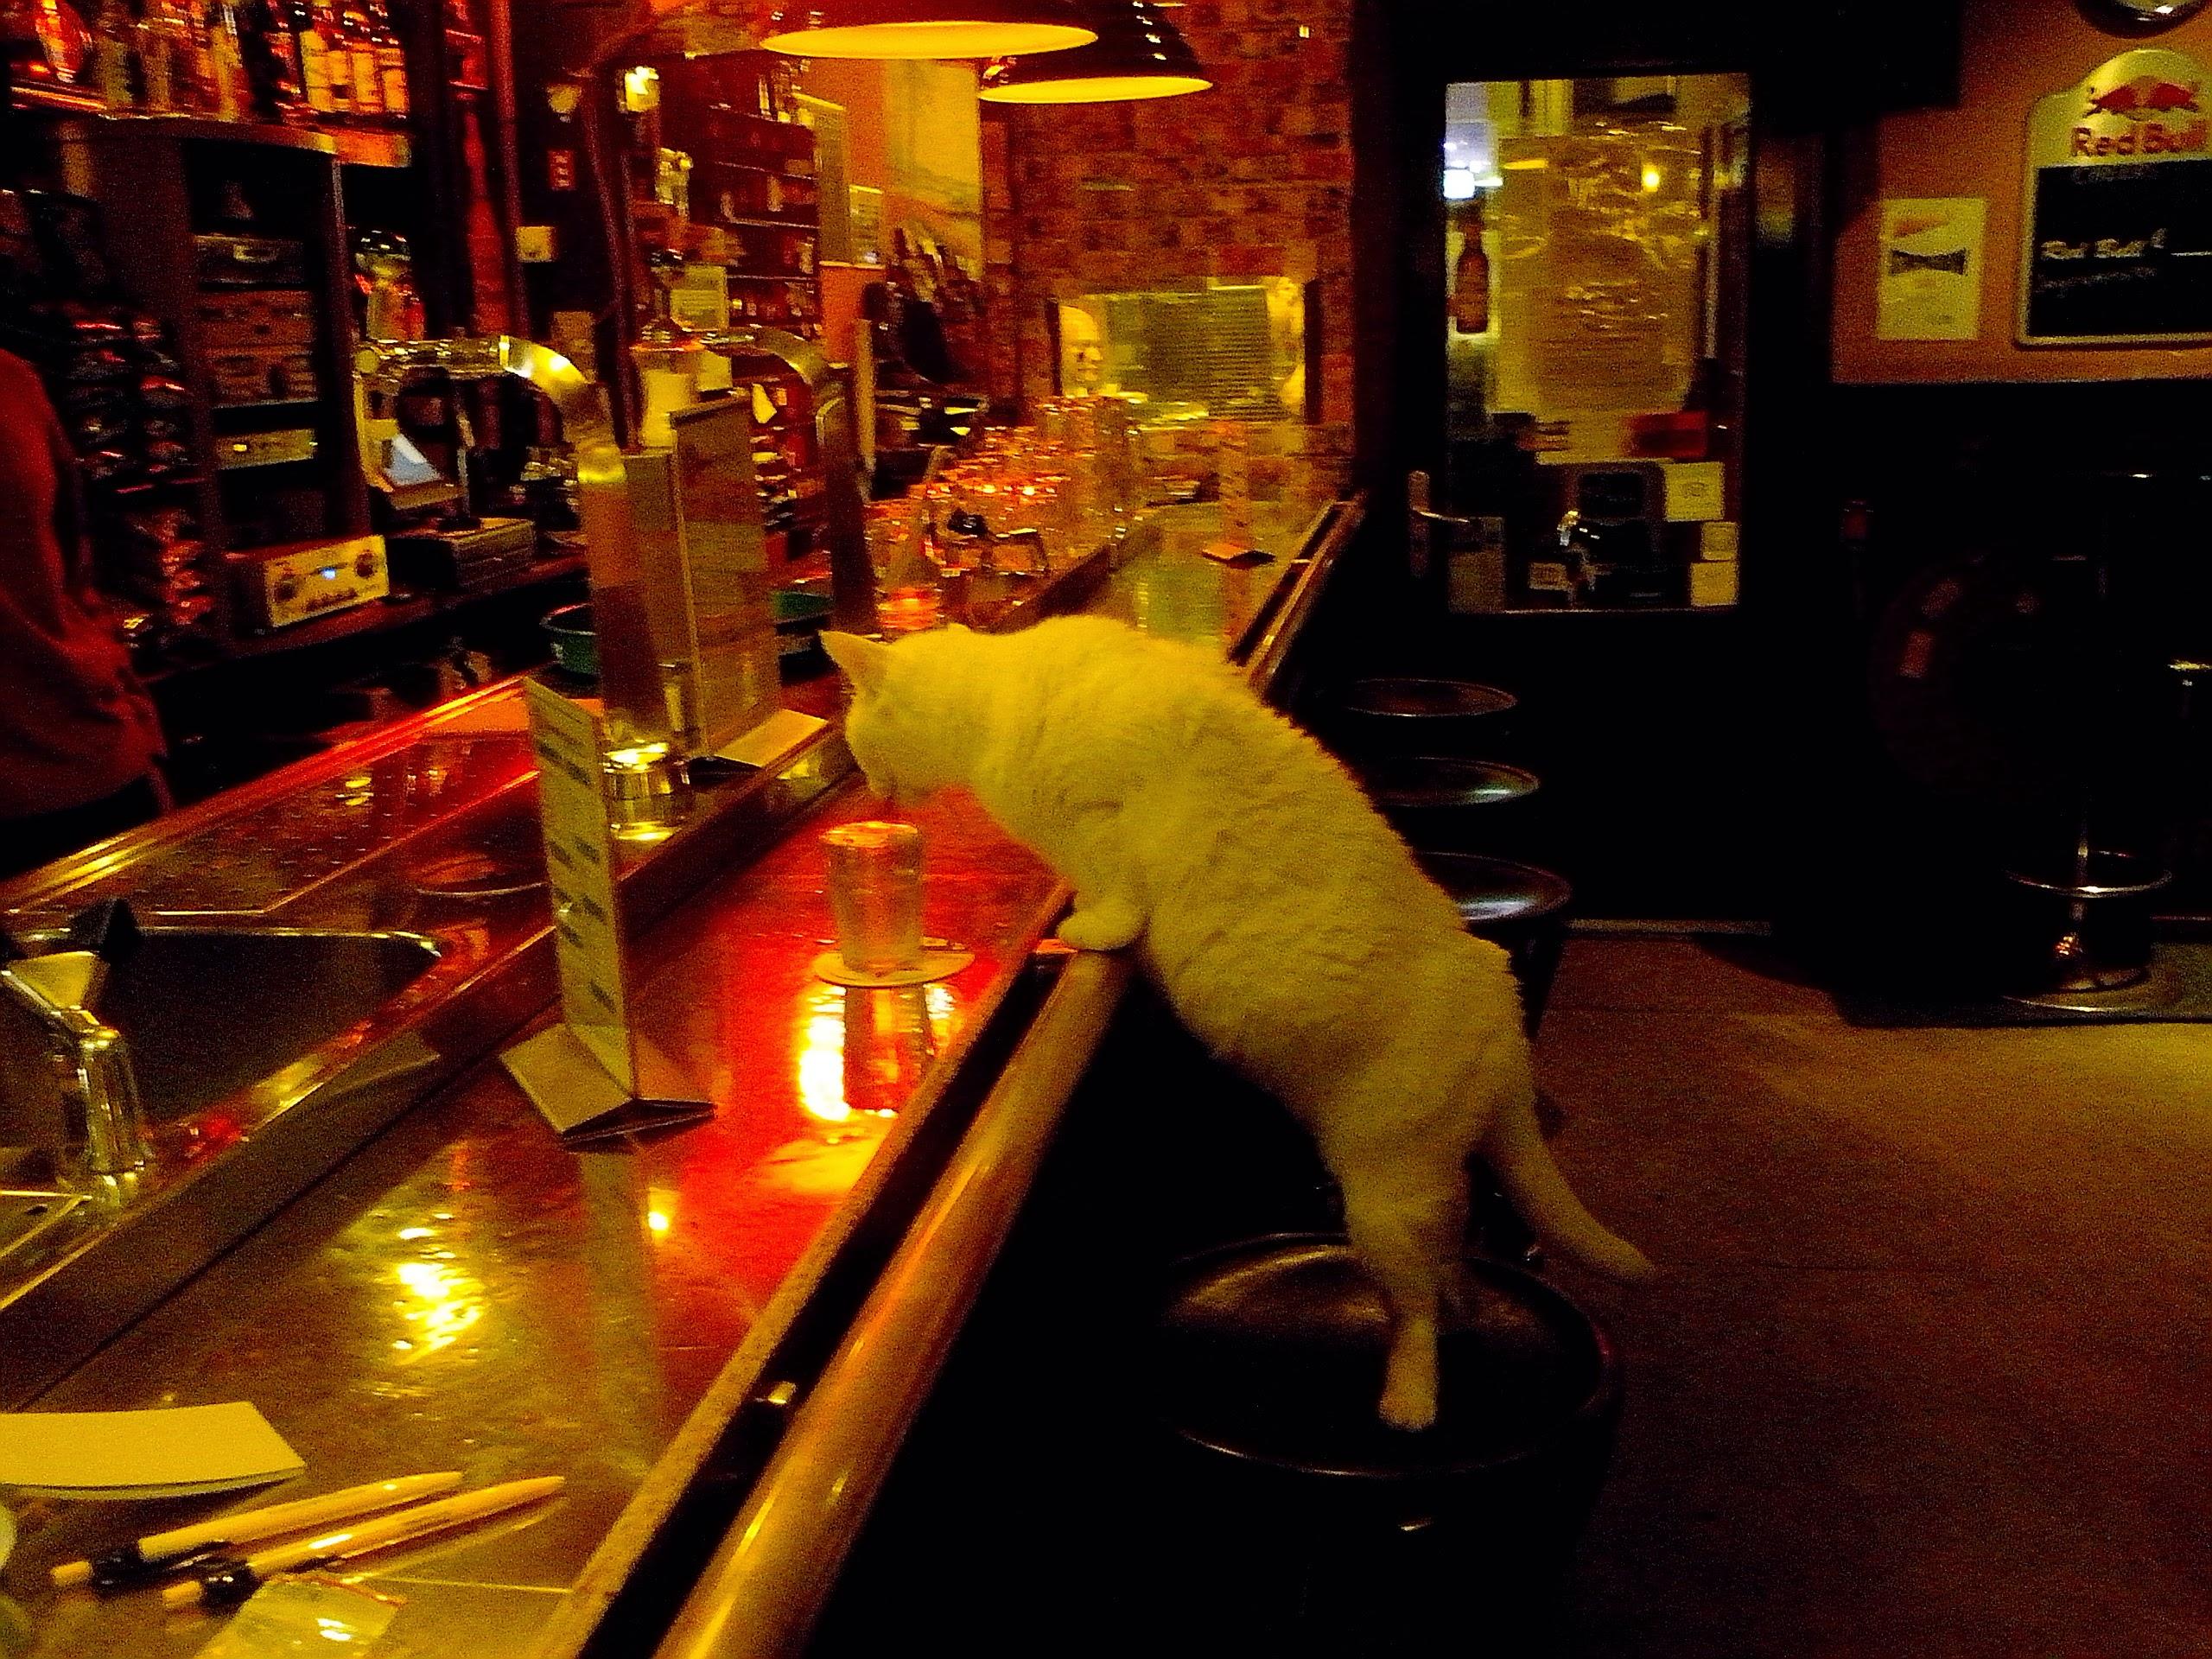 Dutch cat drinking @ the hostel bar